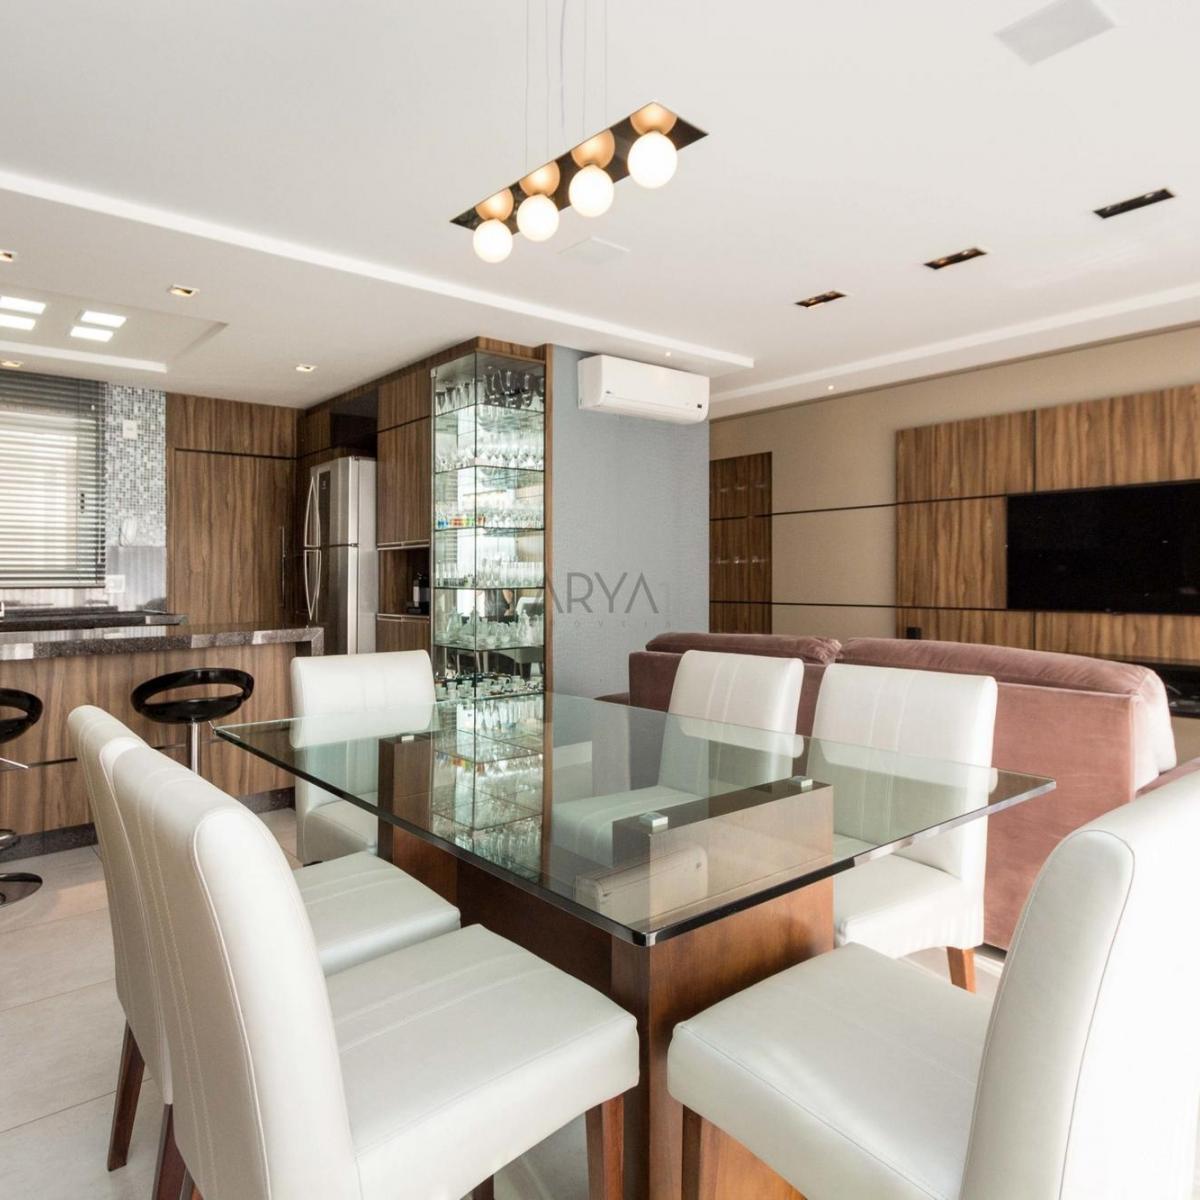 http://www.infocenterhost2.com.br/crm/fotosimovel/290965/89595945-apartamento-curitiba-cristo-rei.jpg